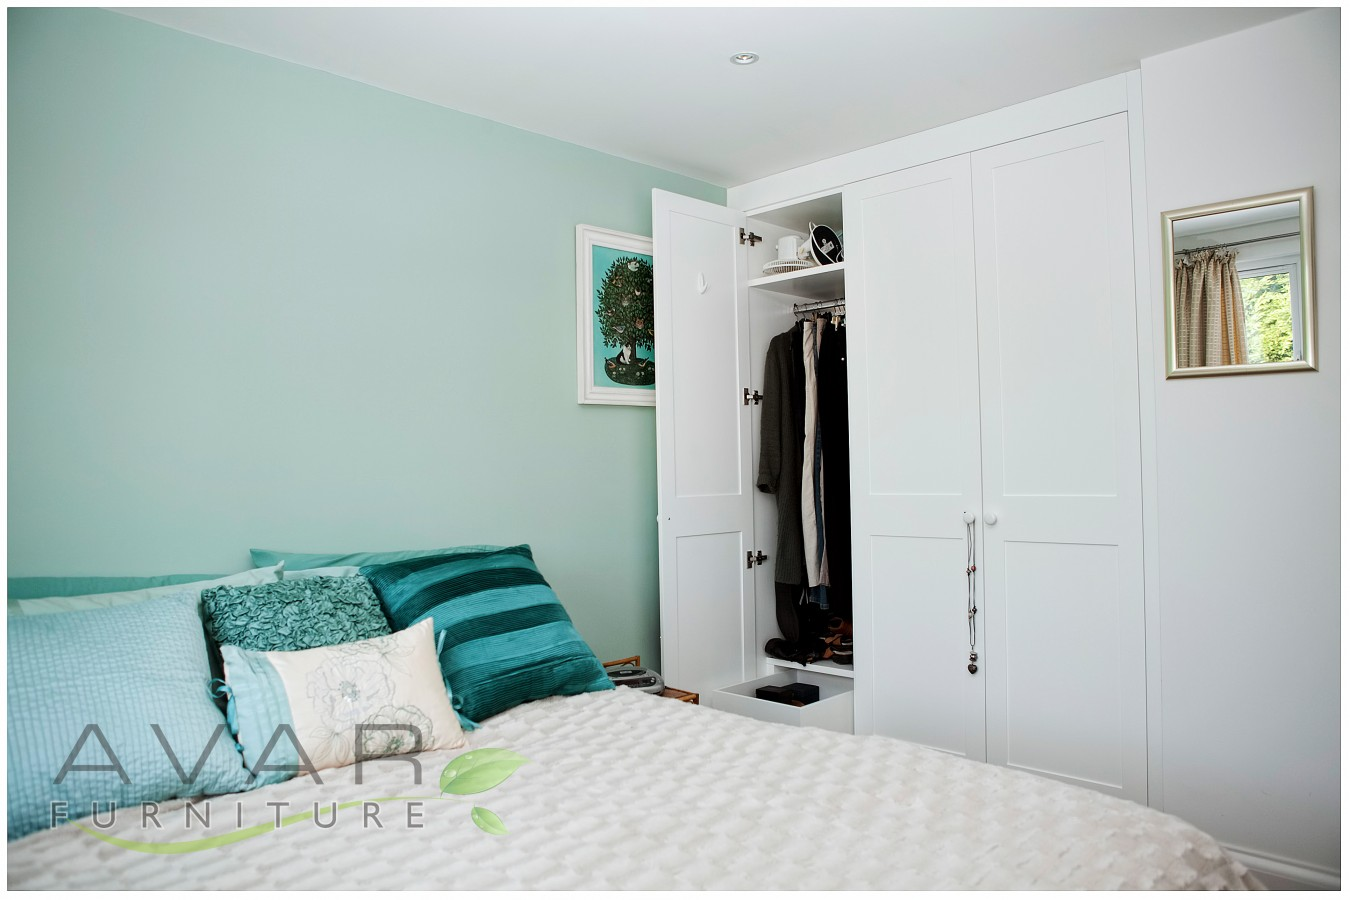 Fitted wardrobe ideas gallery 3 north london uk avar furniture - Fitted Wardrobe Ideas Gallery 11 North London Uk